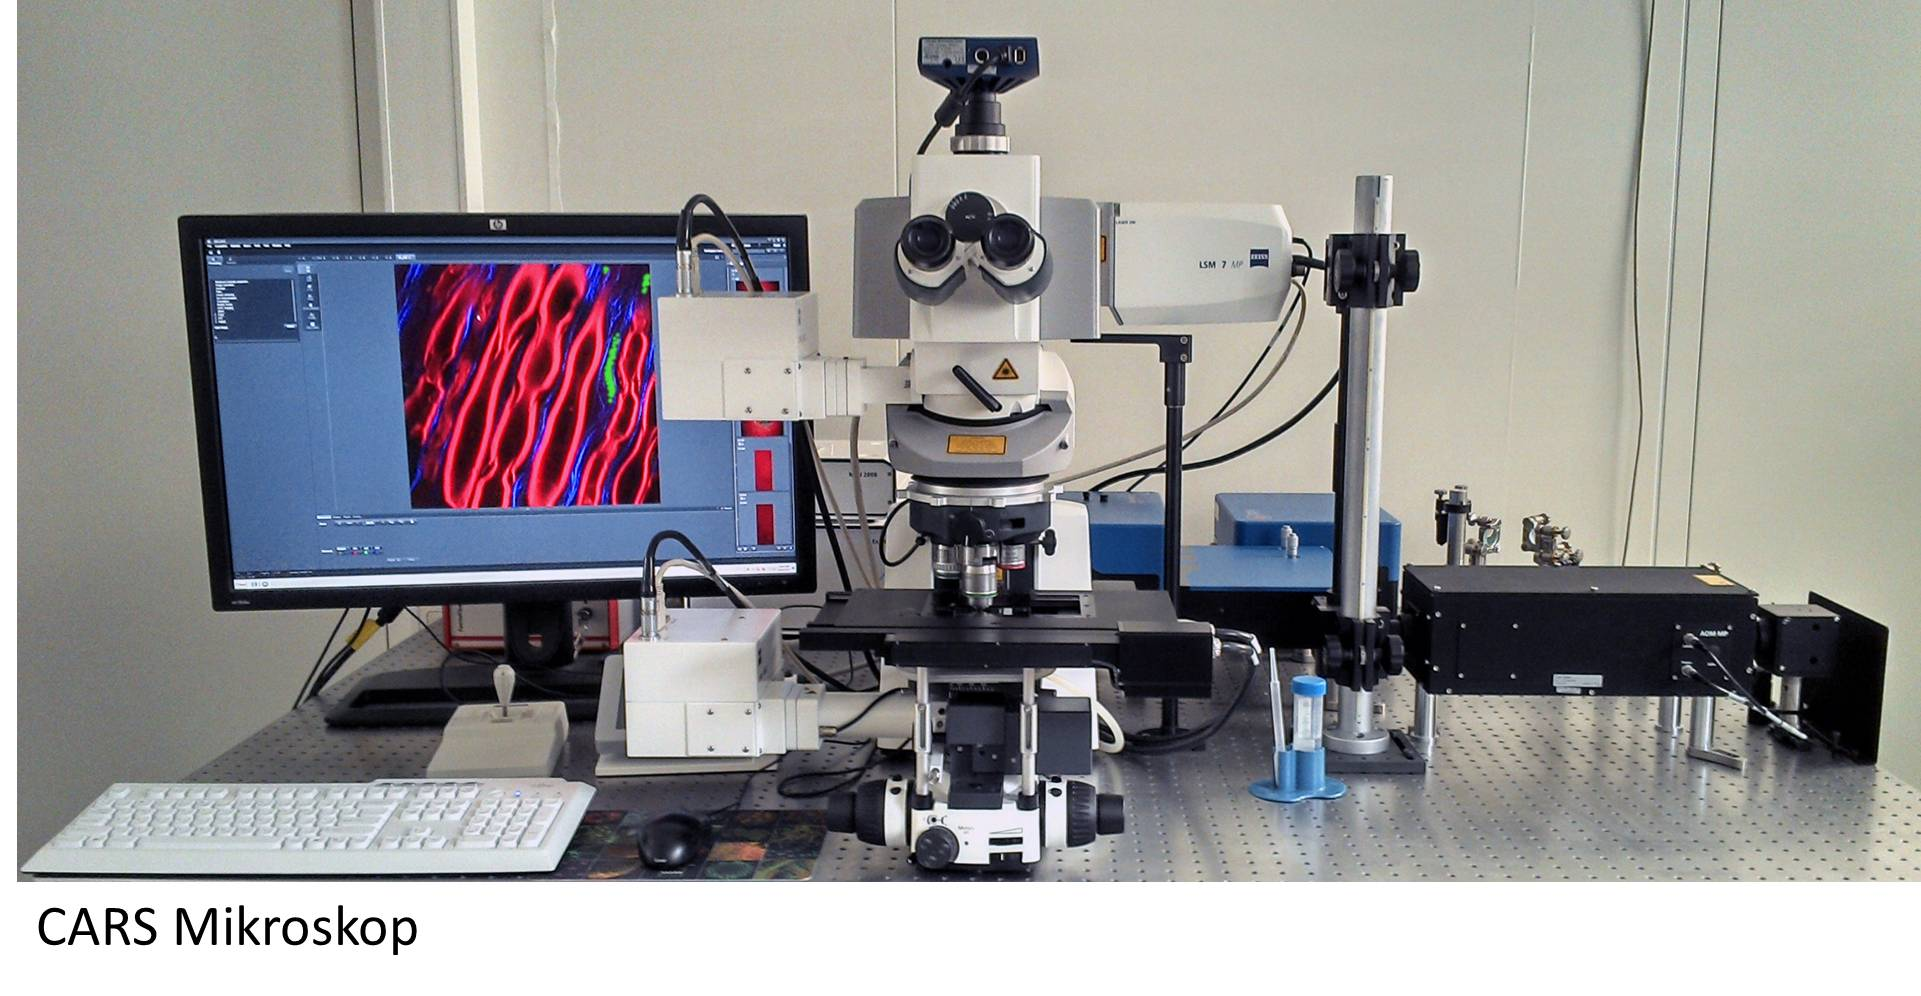 CARS Mikroskop